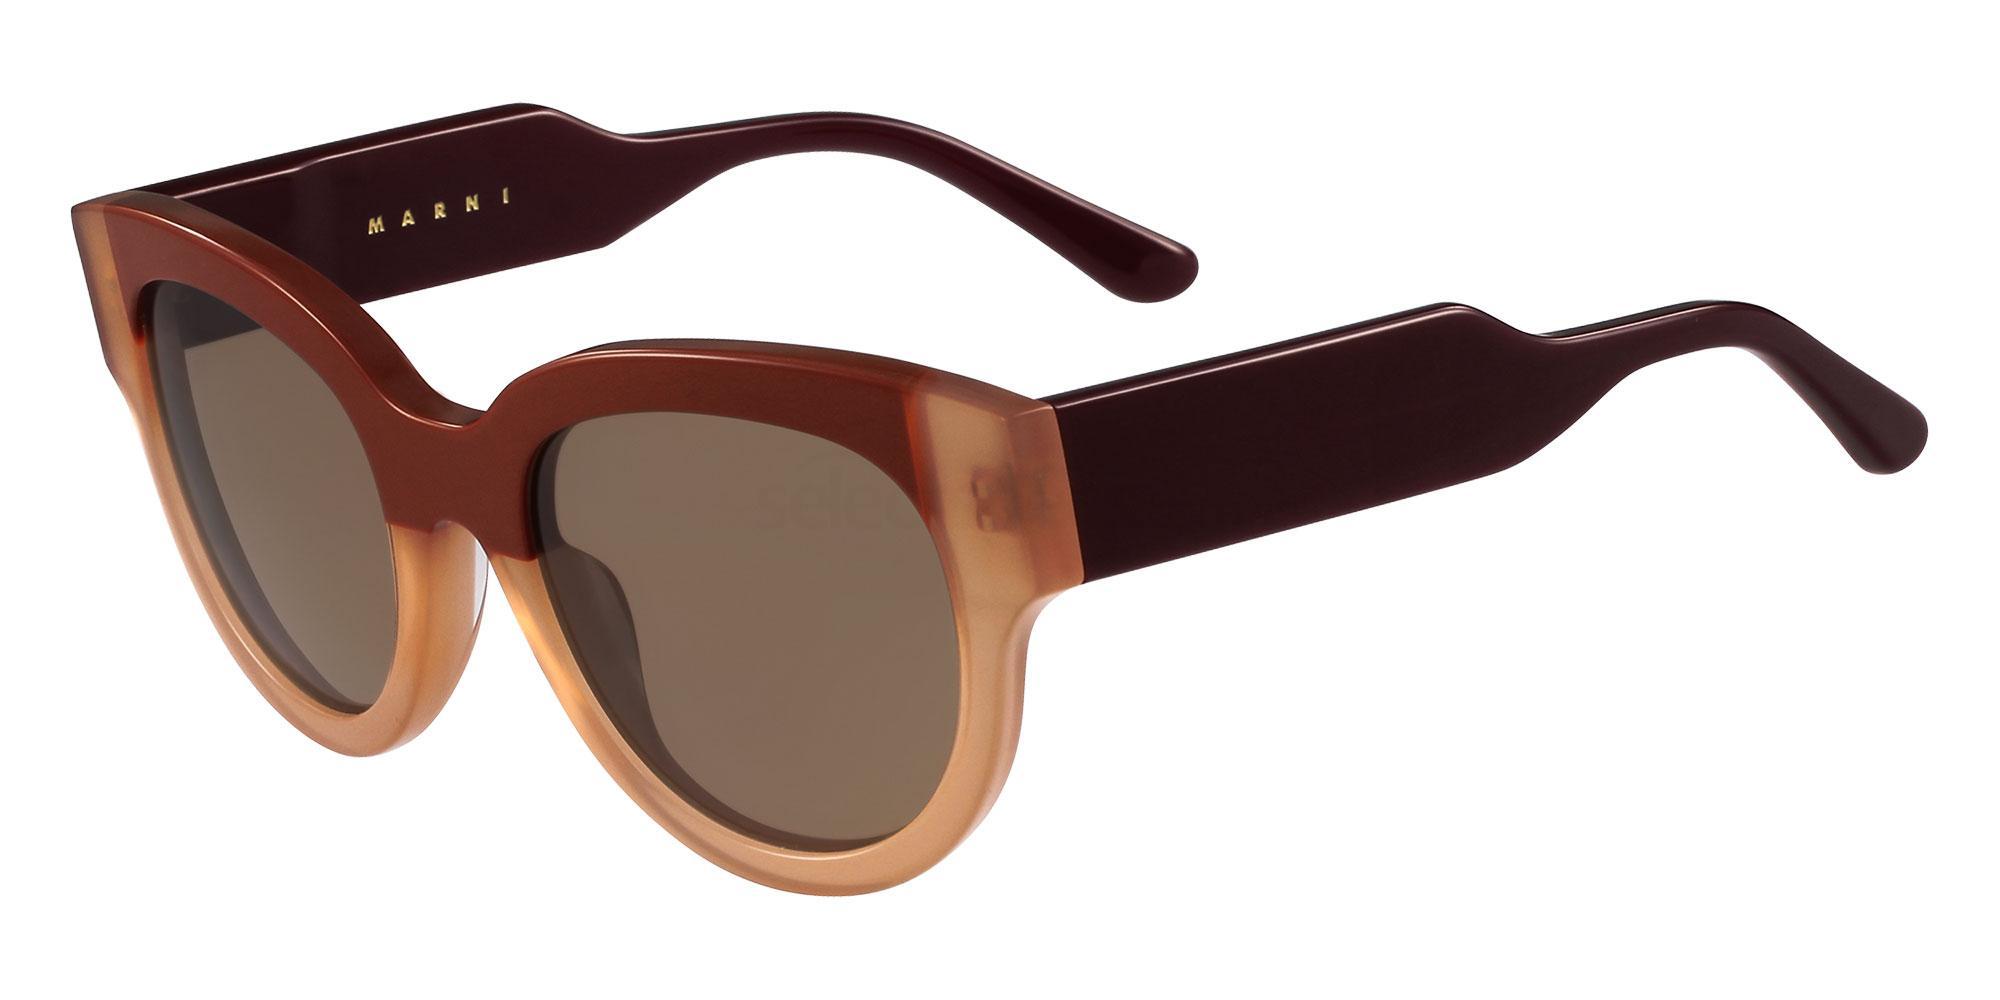 205 ME600S Sunglasses, Marni